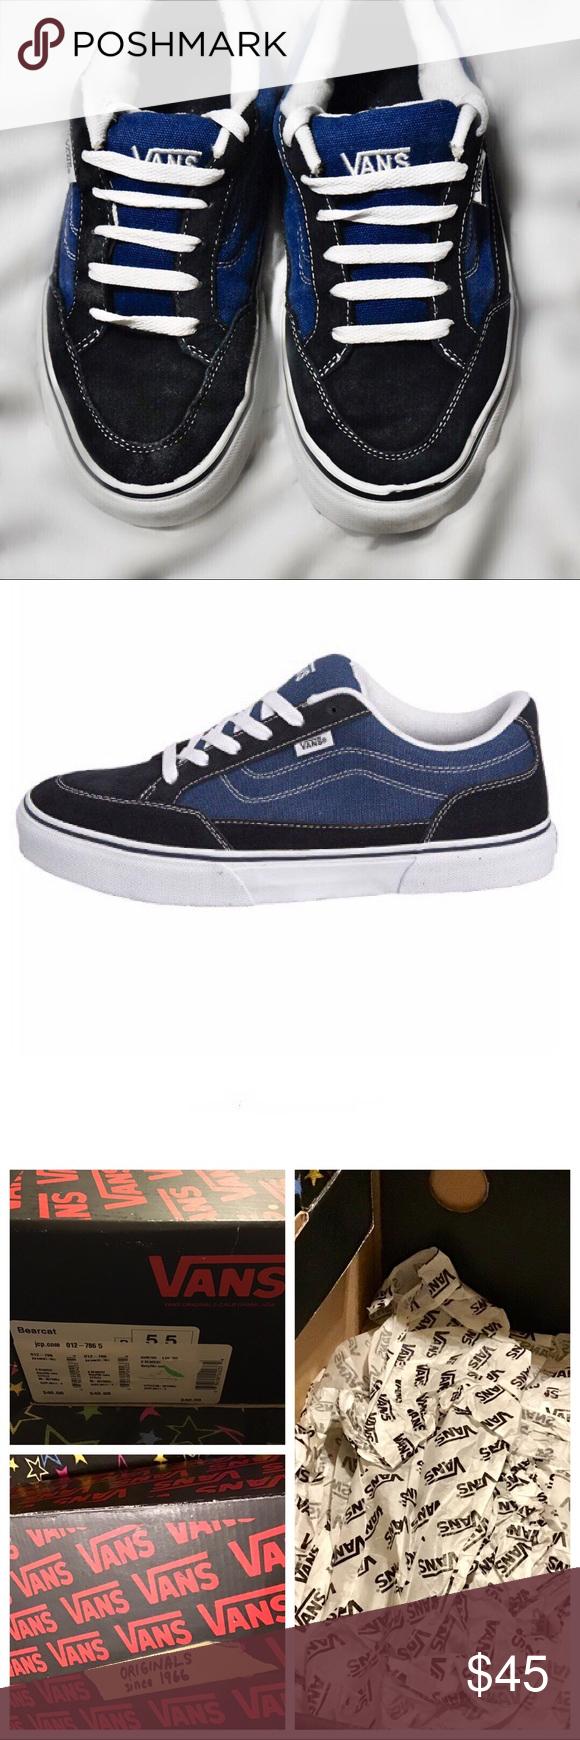 Vans Bearcat Skate Shoes Vans Bearcat Shoes, Suede/canvas